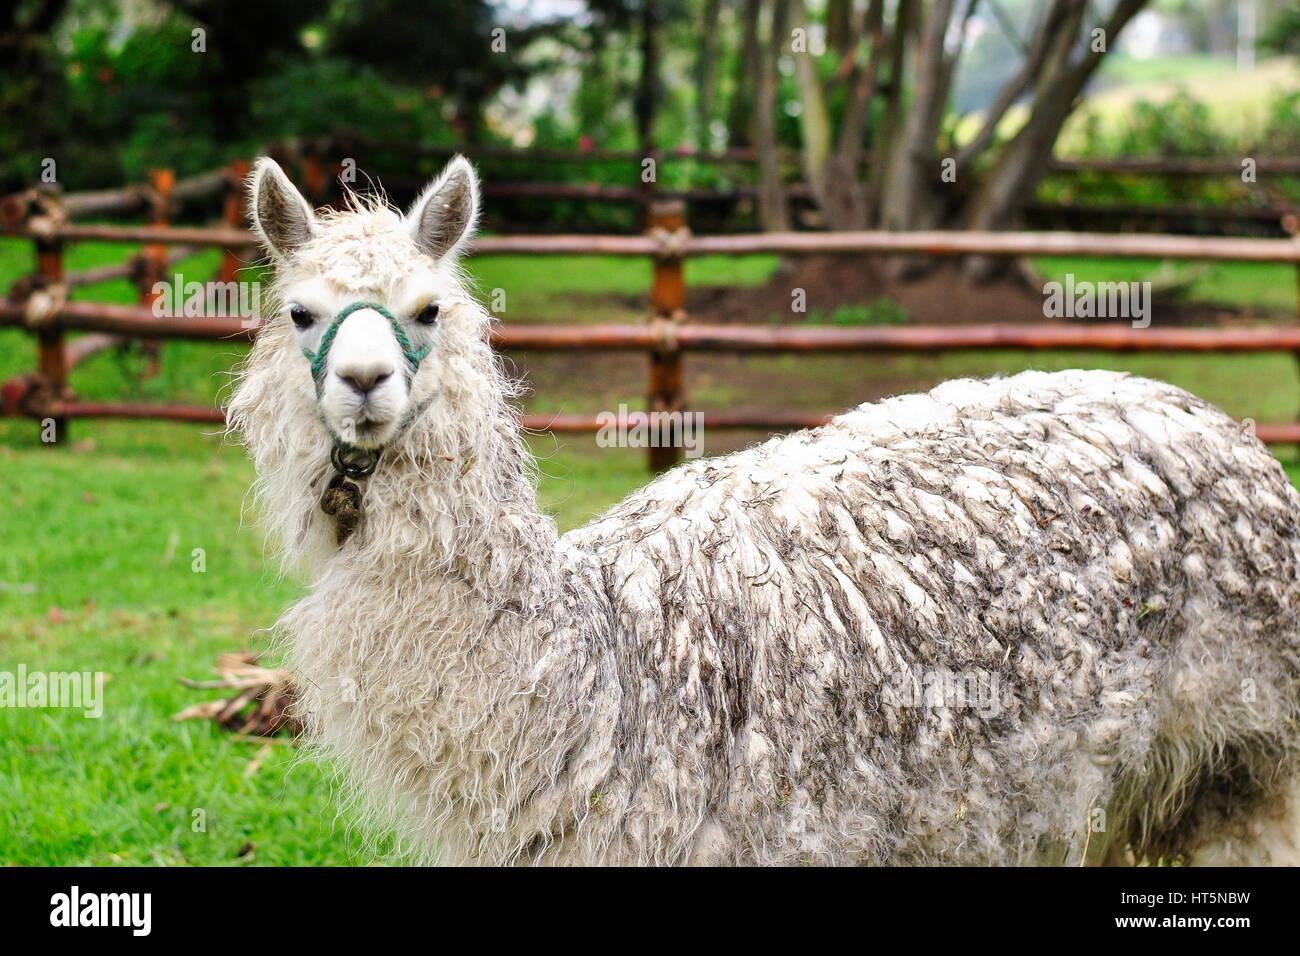 Llama (lama glama) in a garden.  El Tambo.  Ingapirca.  Ecuador - Stock Image